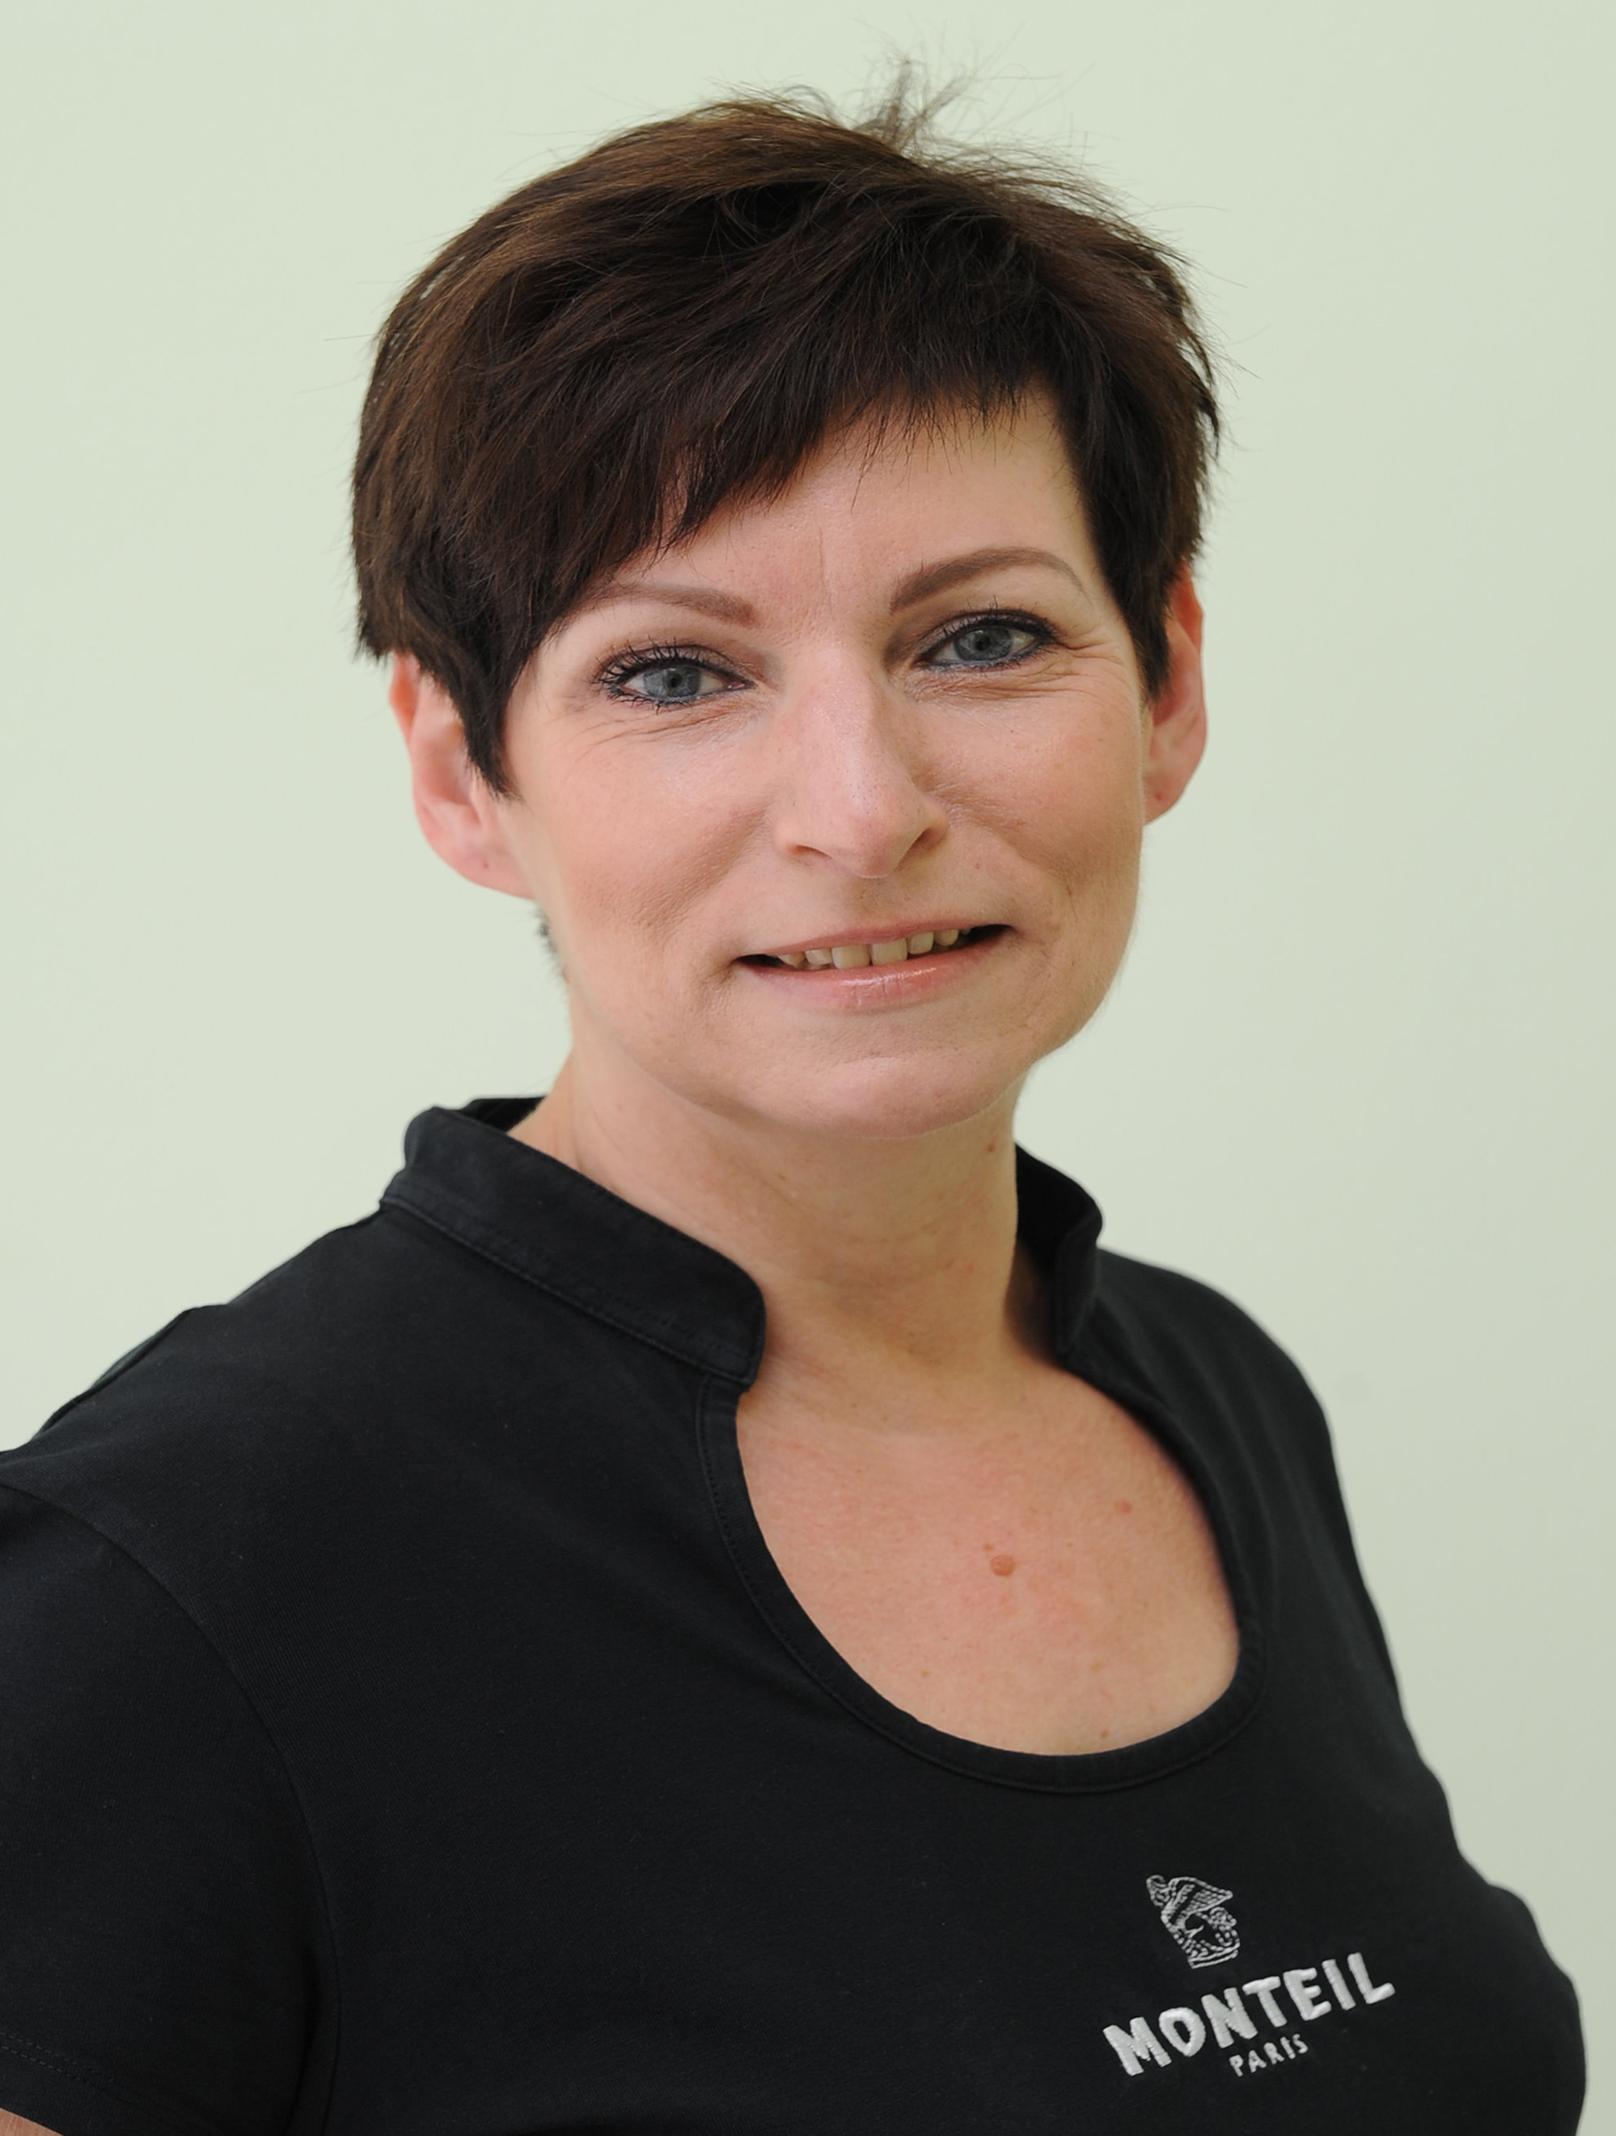 Veronika Menzl